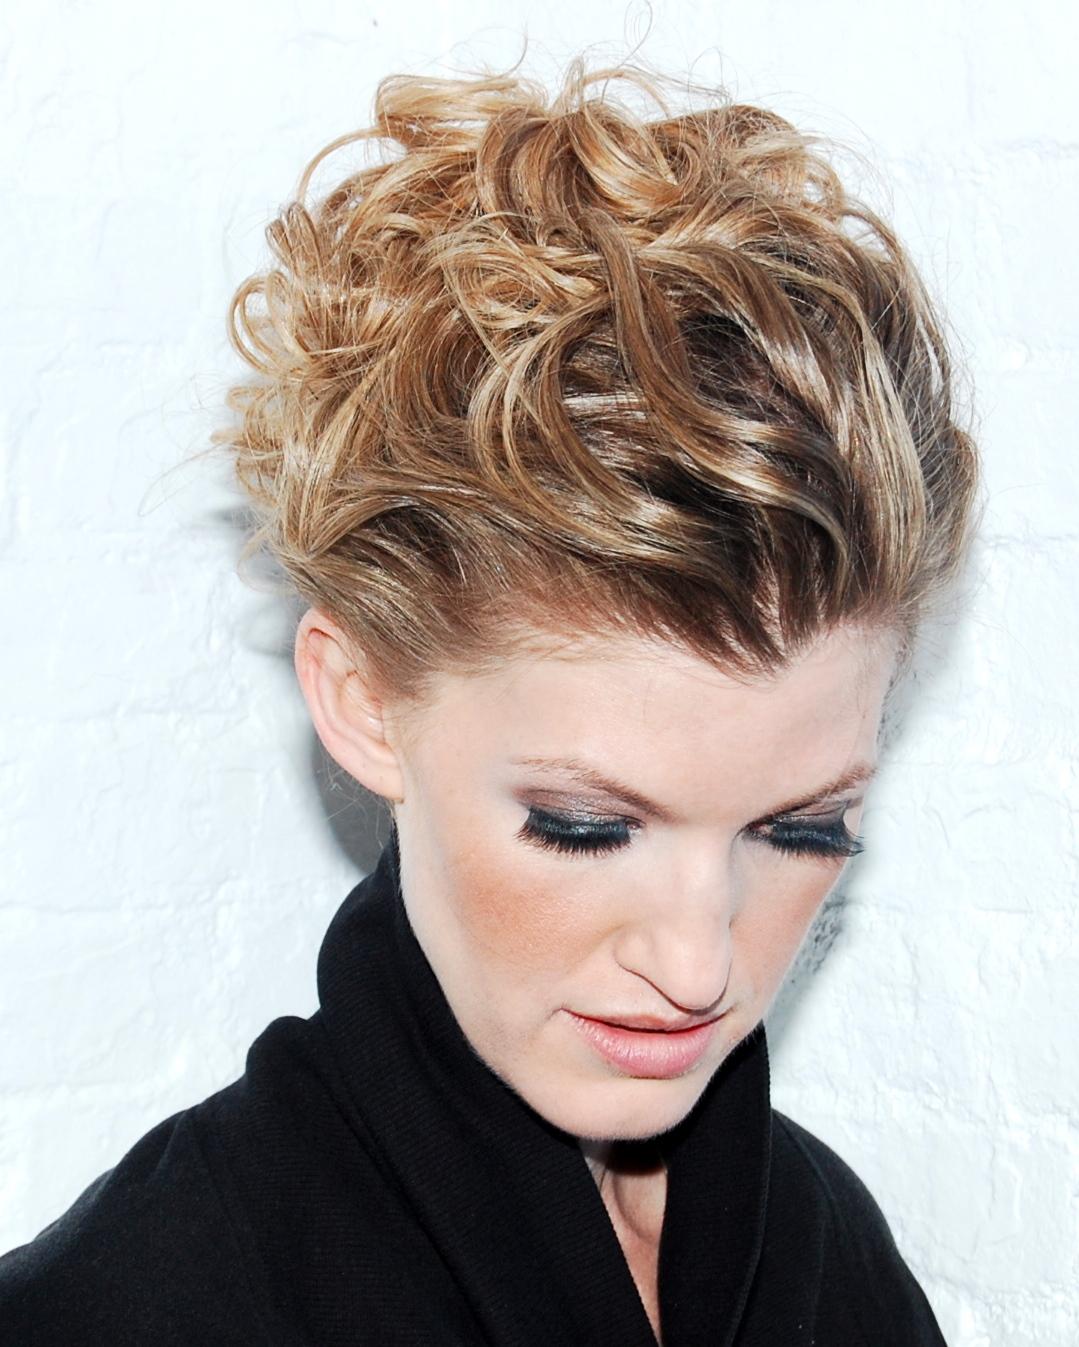 http://3.bp.blogspot.com/-BESuSGKq-14/TzB9O-gRgBI/AAAAAAAABrE/2EJJEc8thGc/s1600/blonde+model+26.JPG